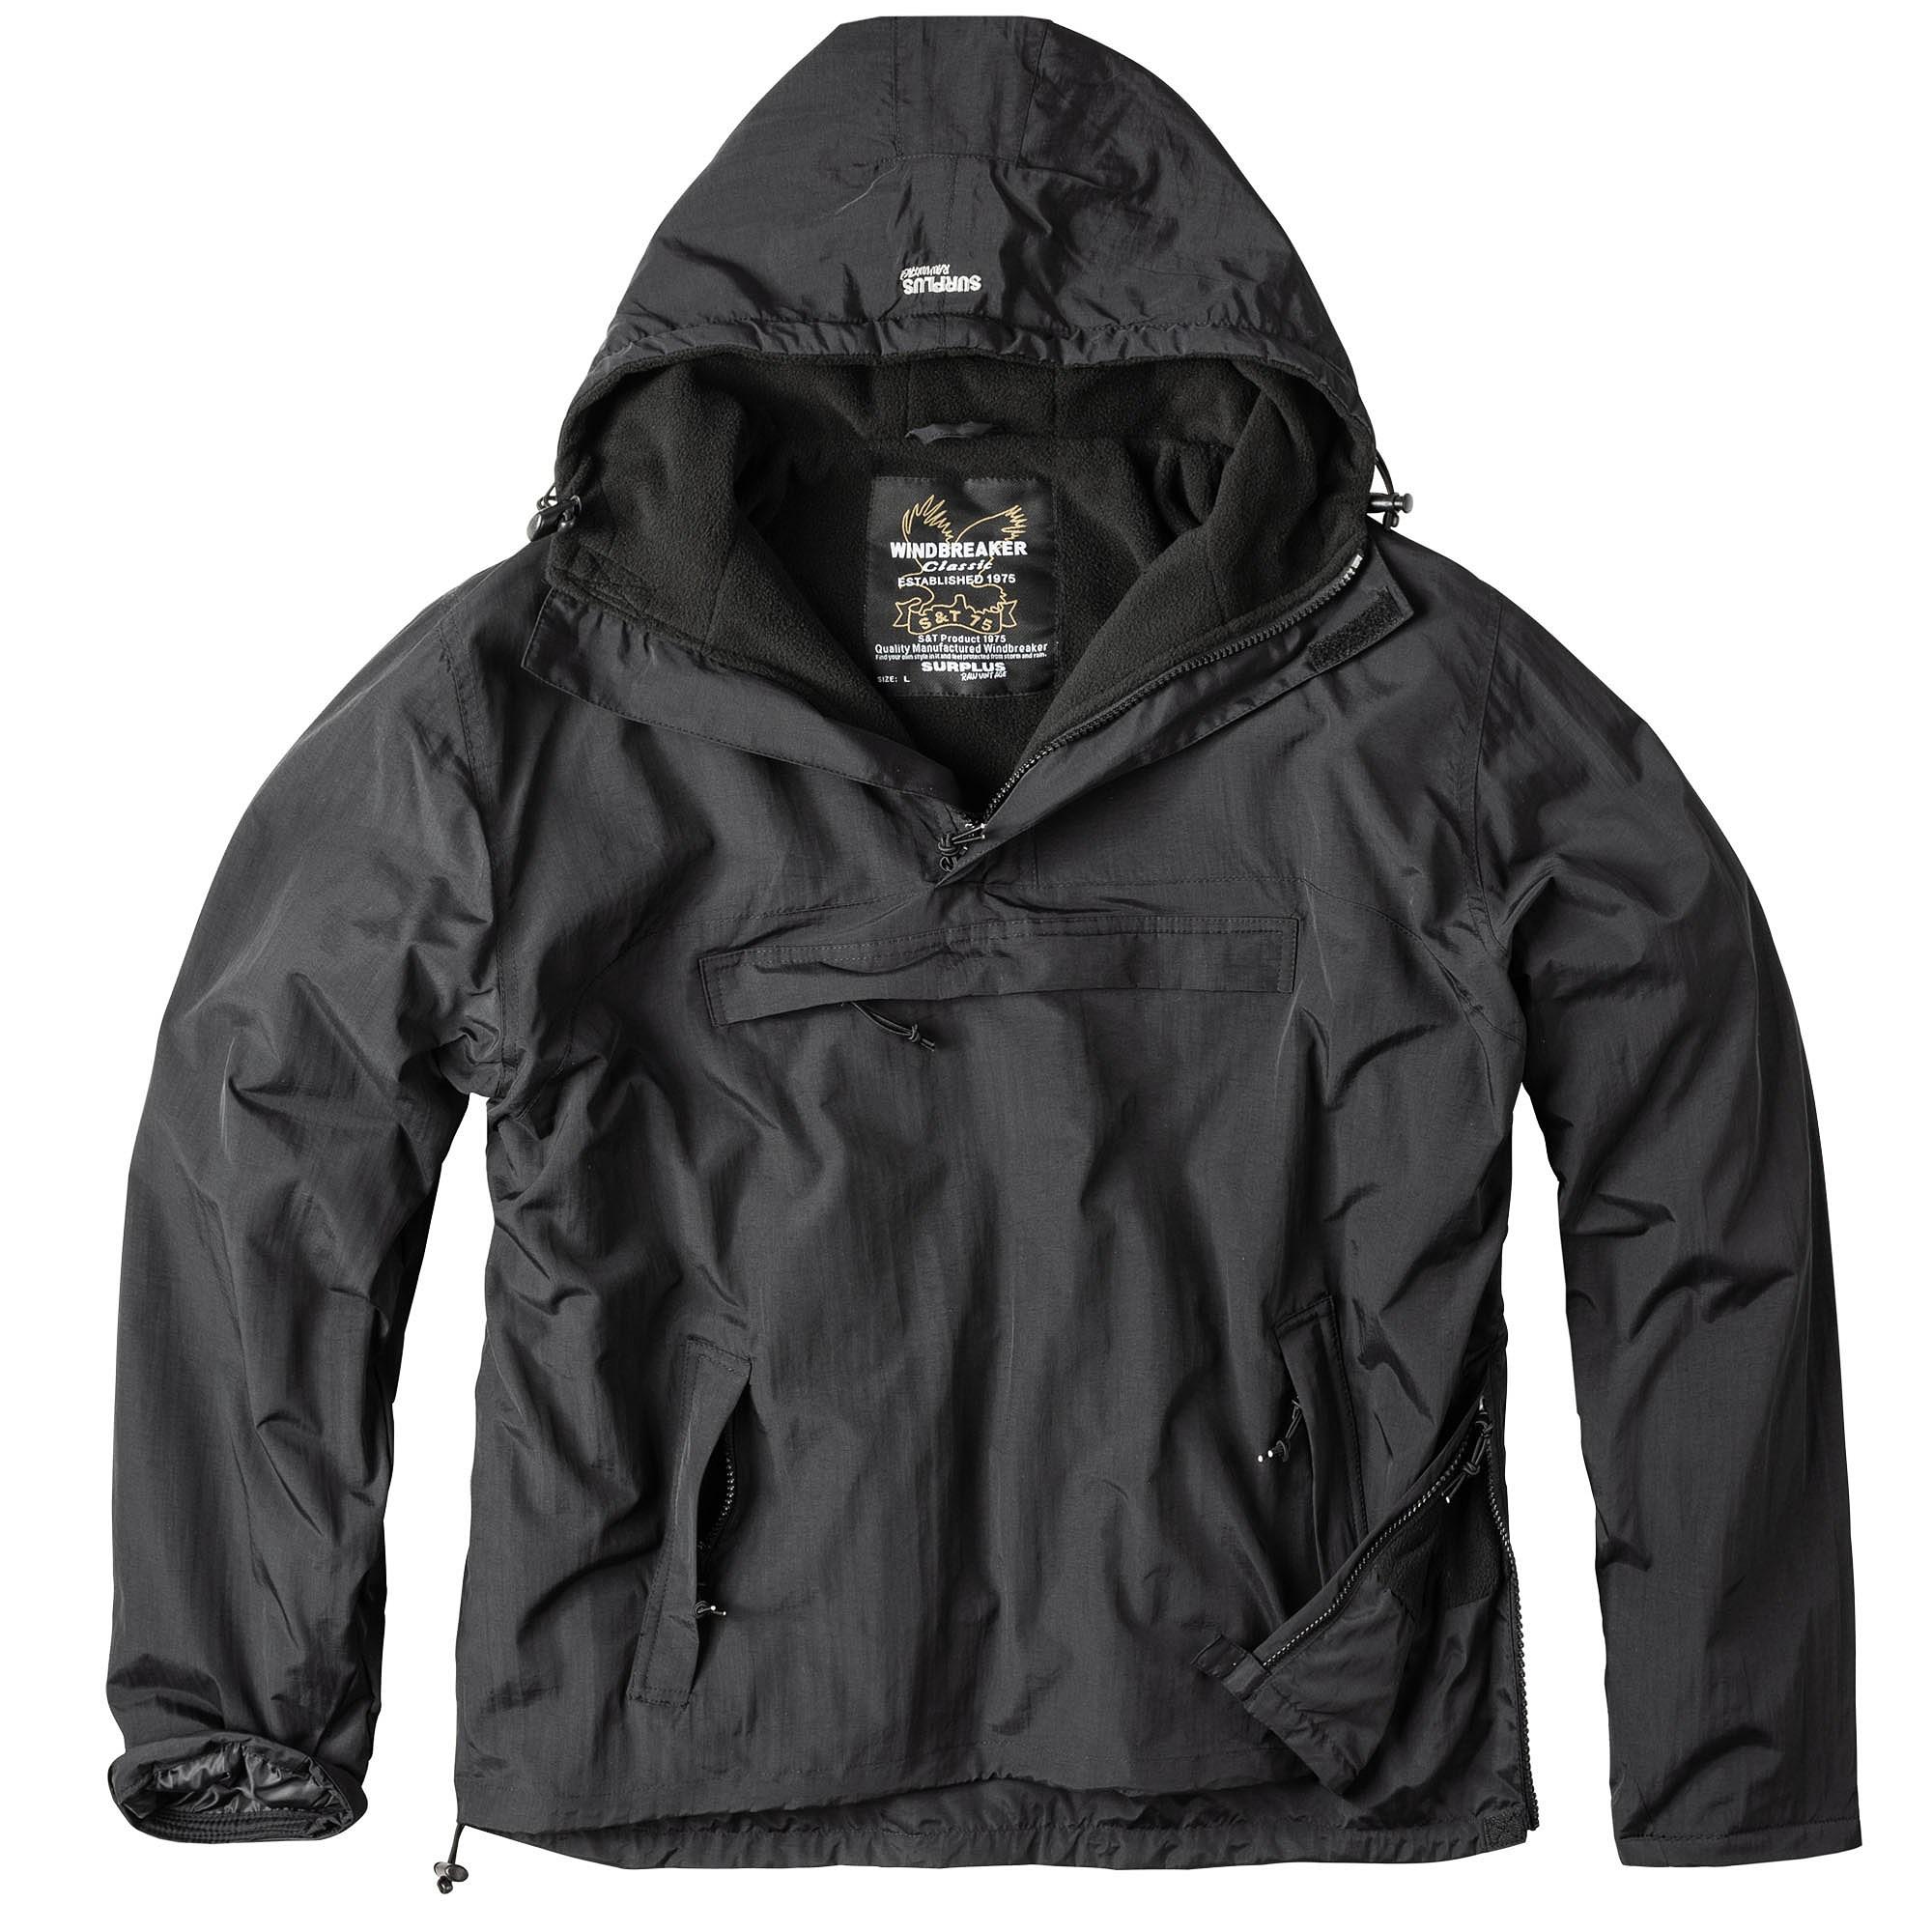 WINDBREAKER Jacket BLACK SURPLUS 20-7001-03 L-11